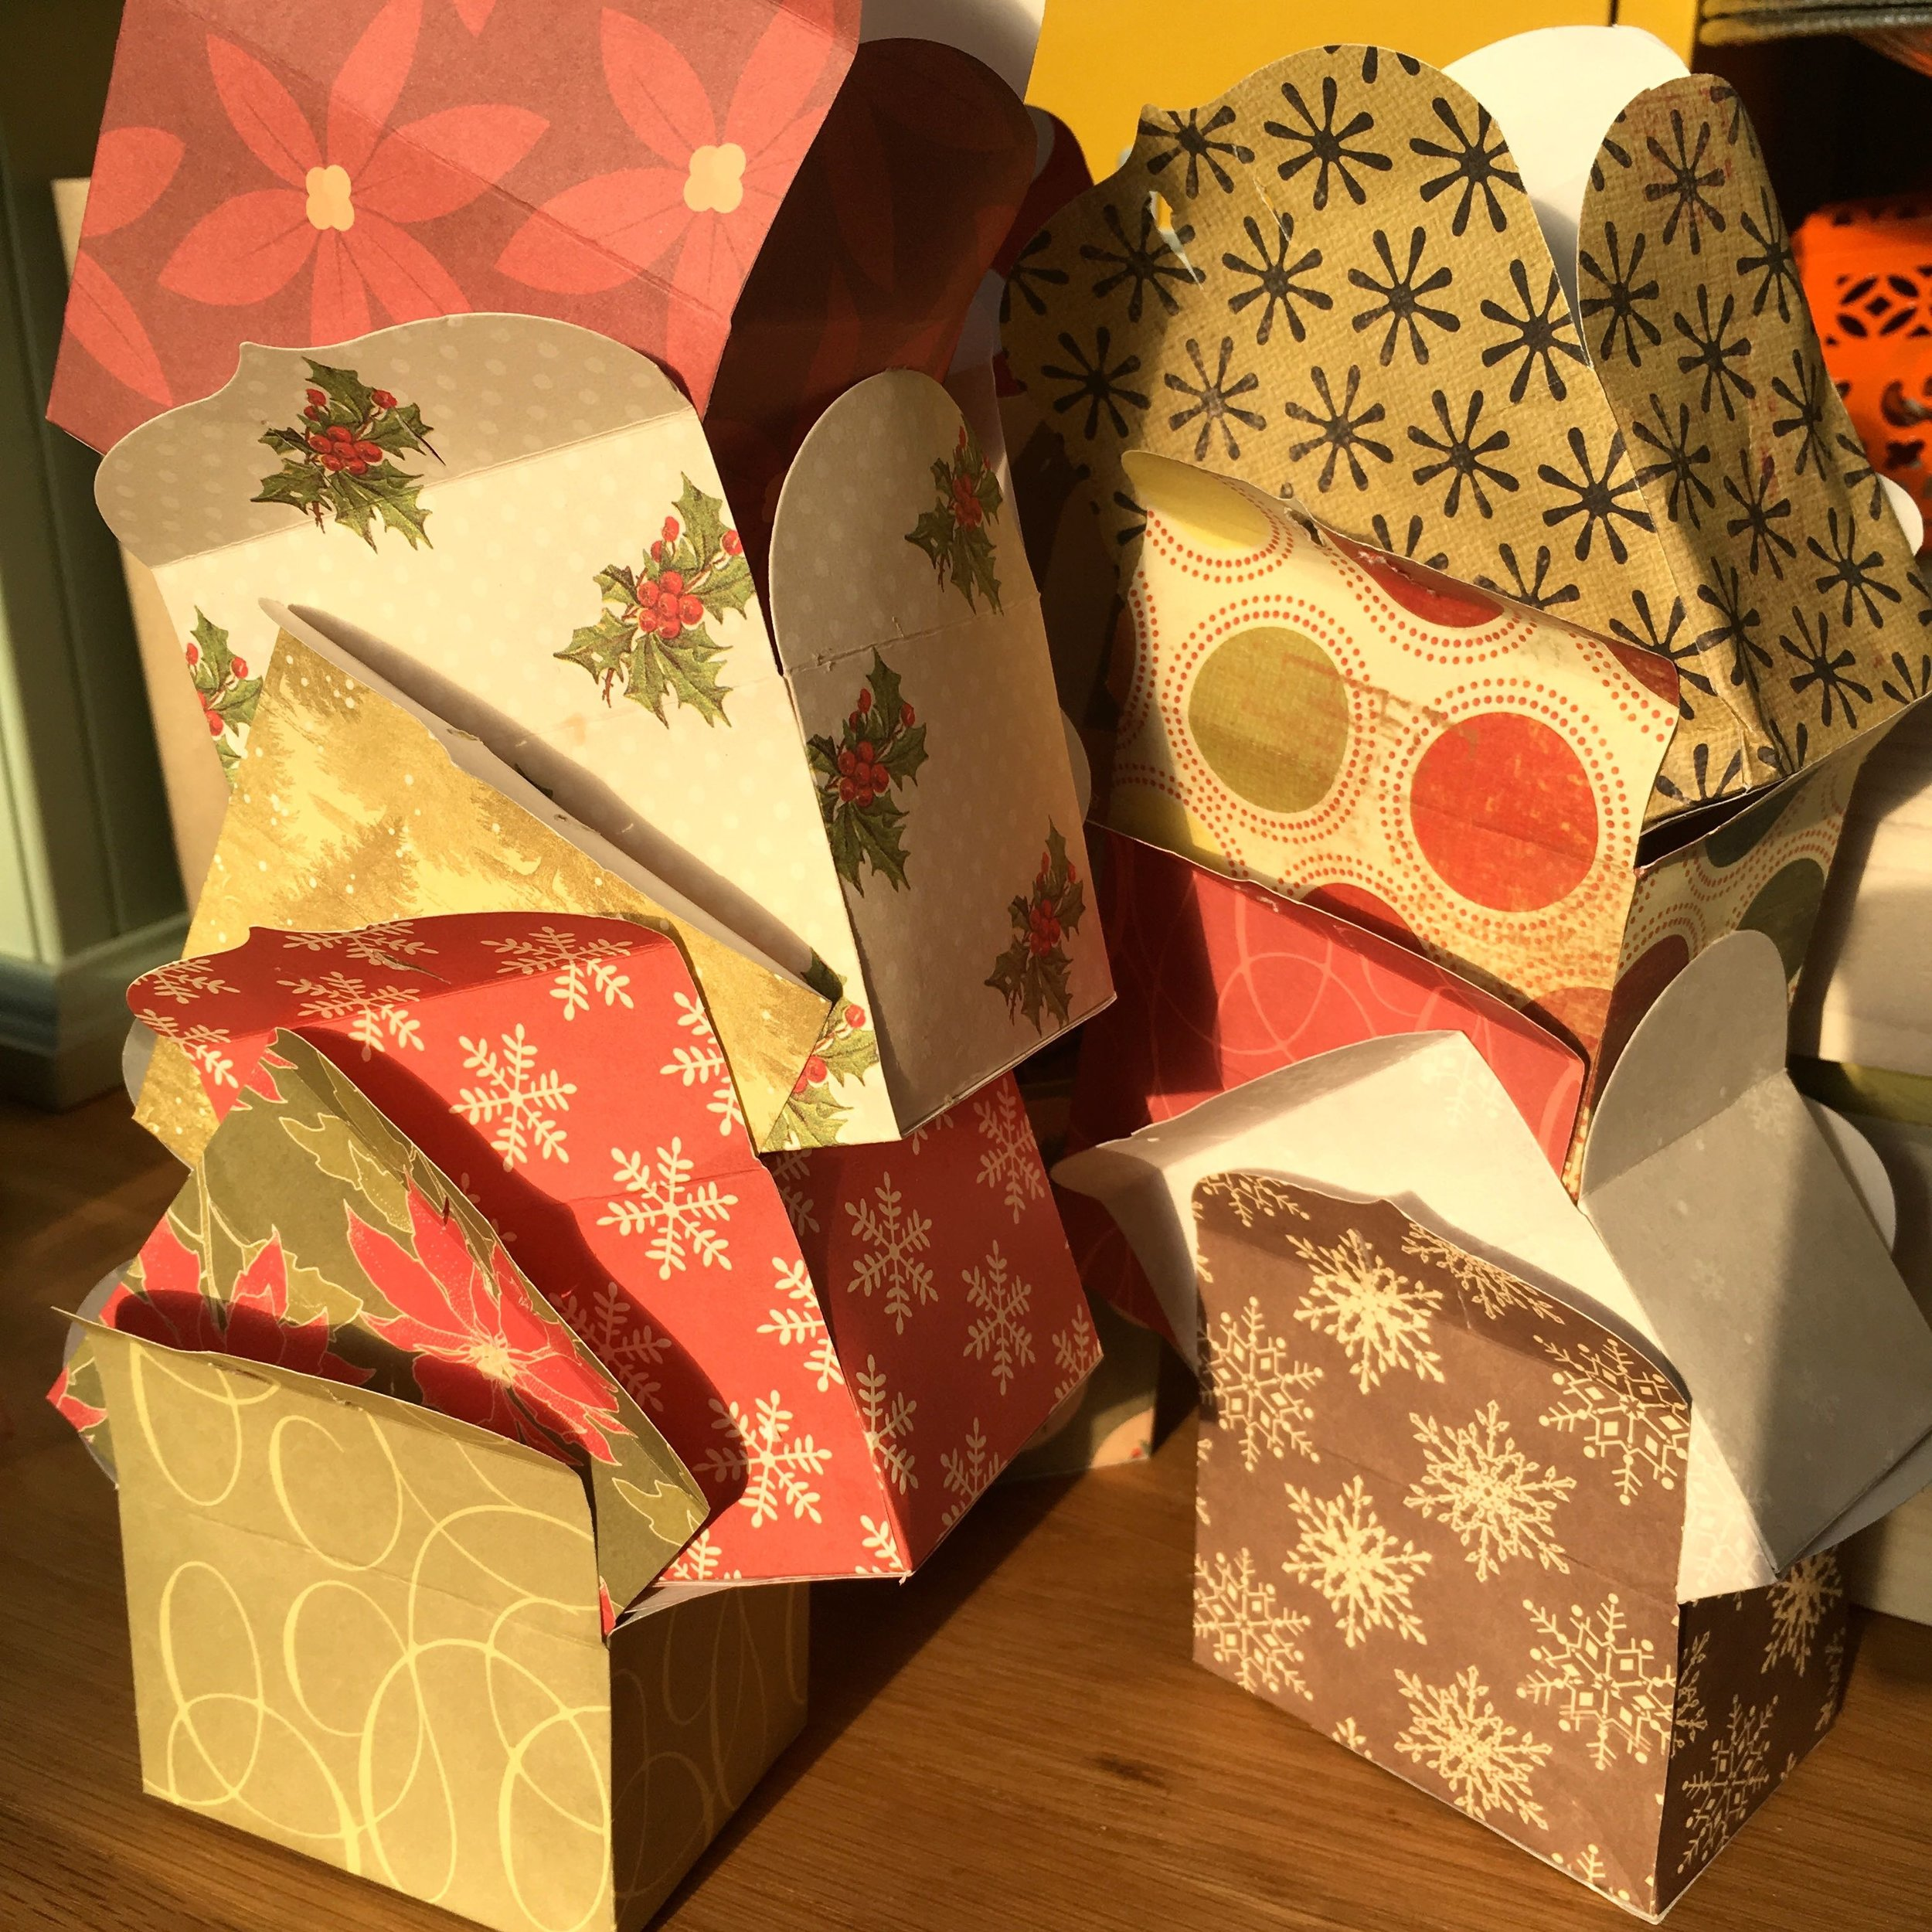 Remember those advent calendar boxes?